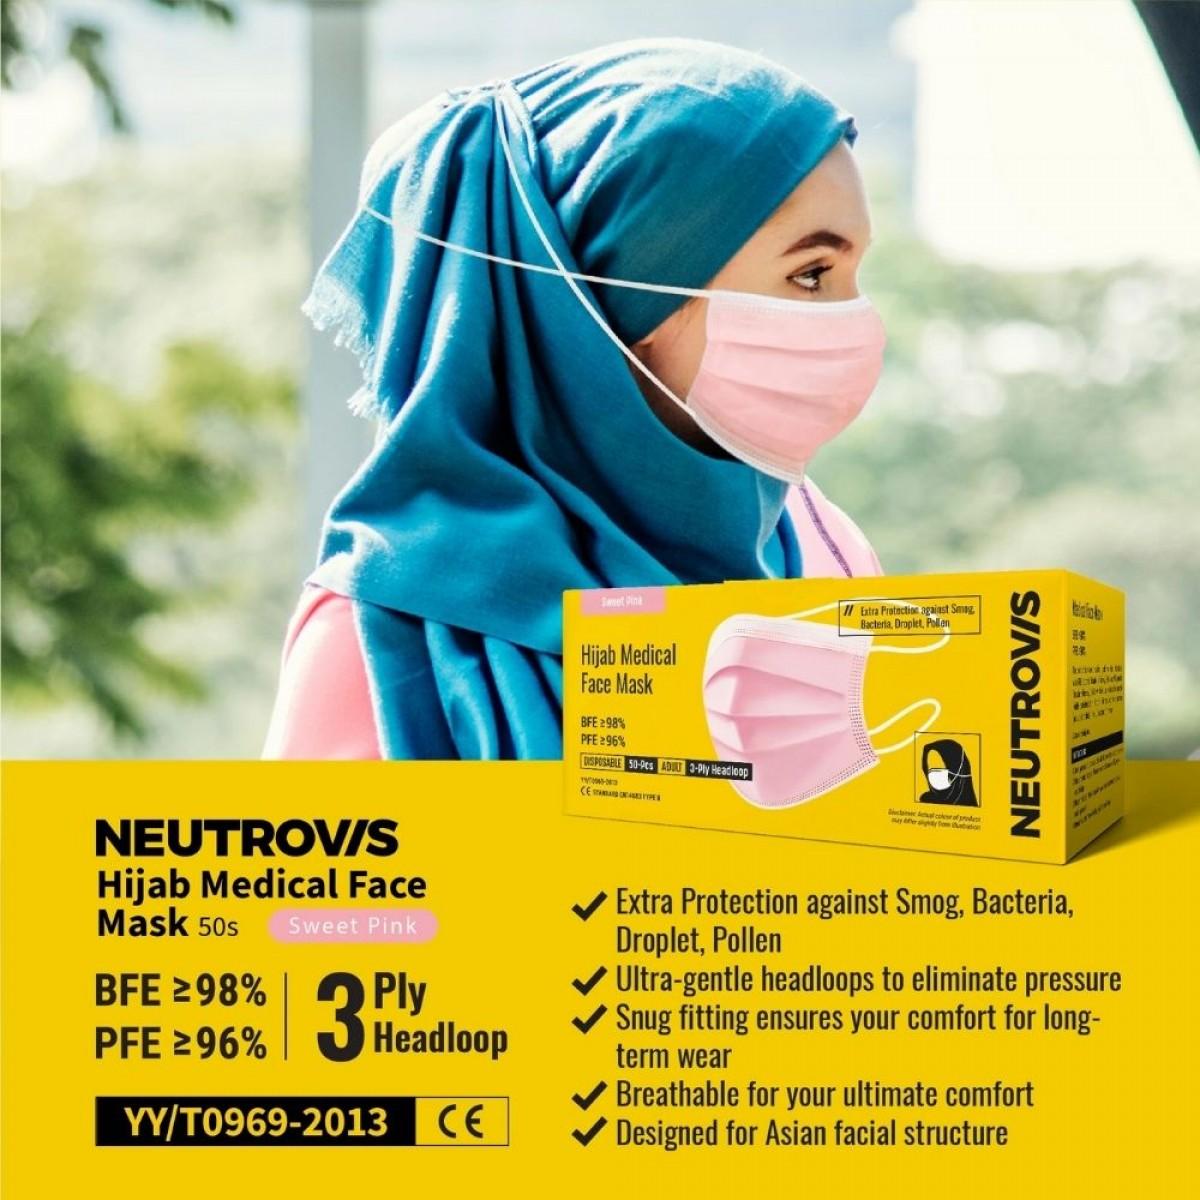 Neutrovis Hijab Medical Face Mask 50pcs